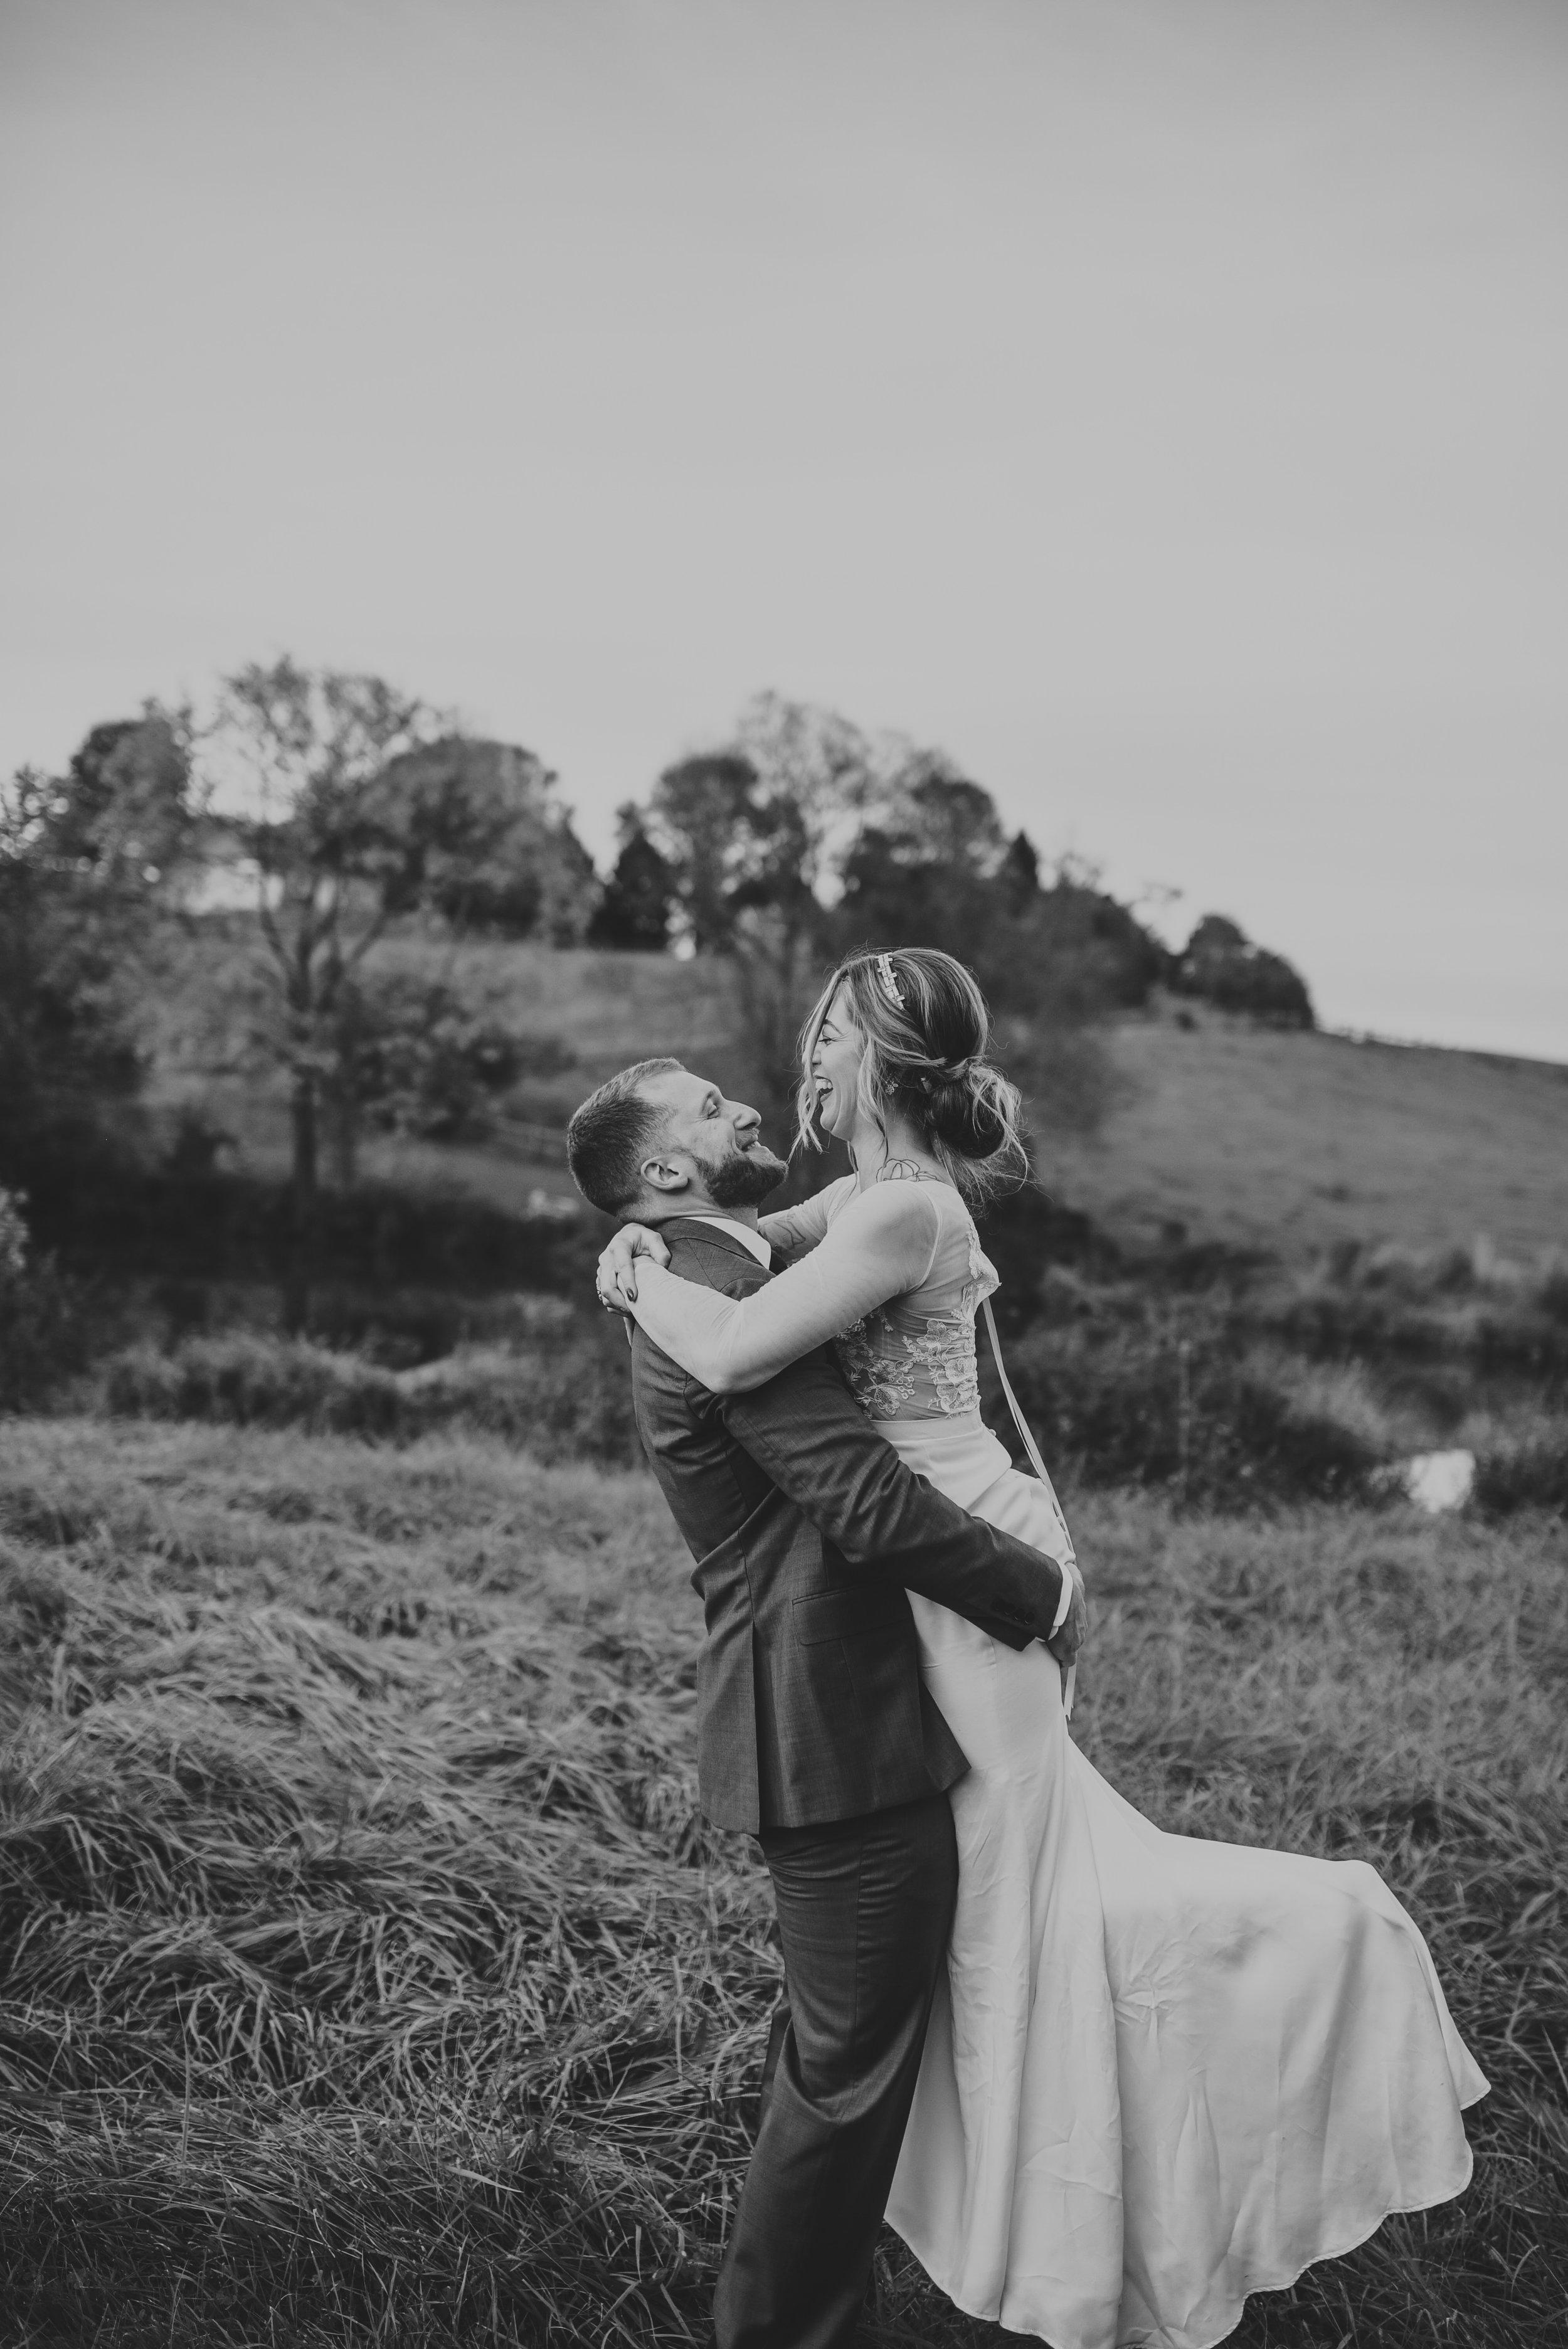 agpcollective_korn_coupleportraits-0647.jpg